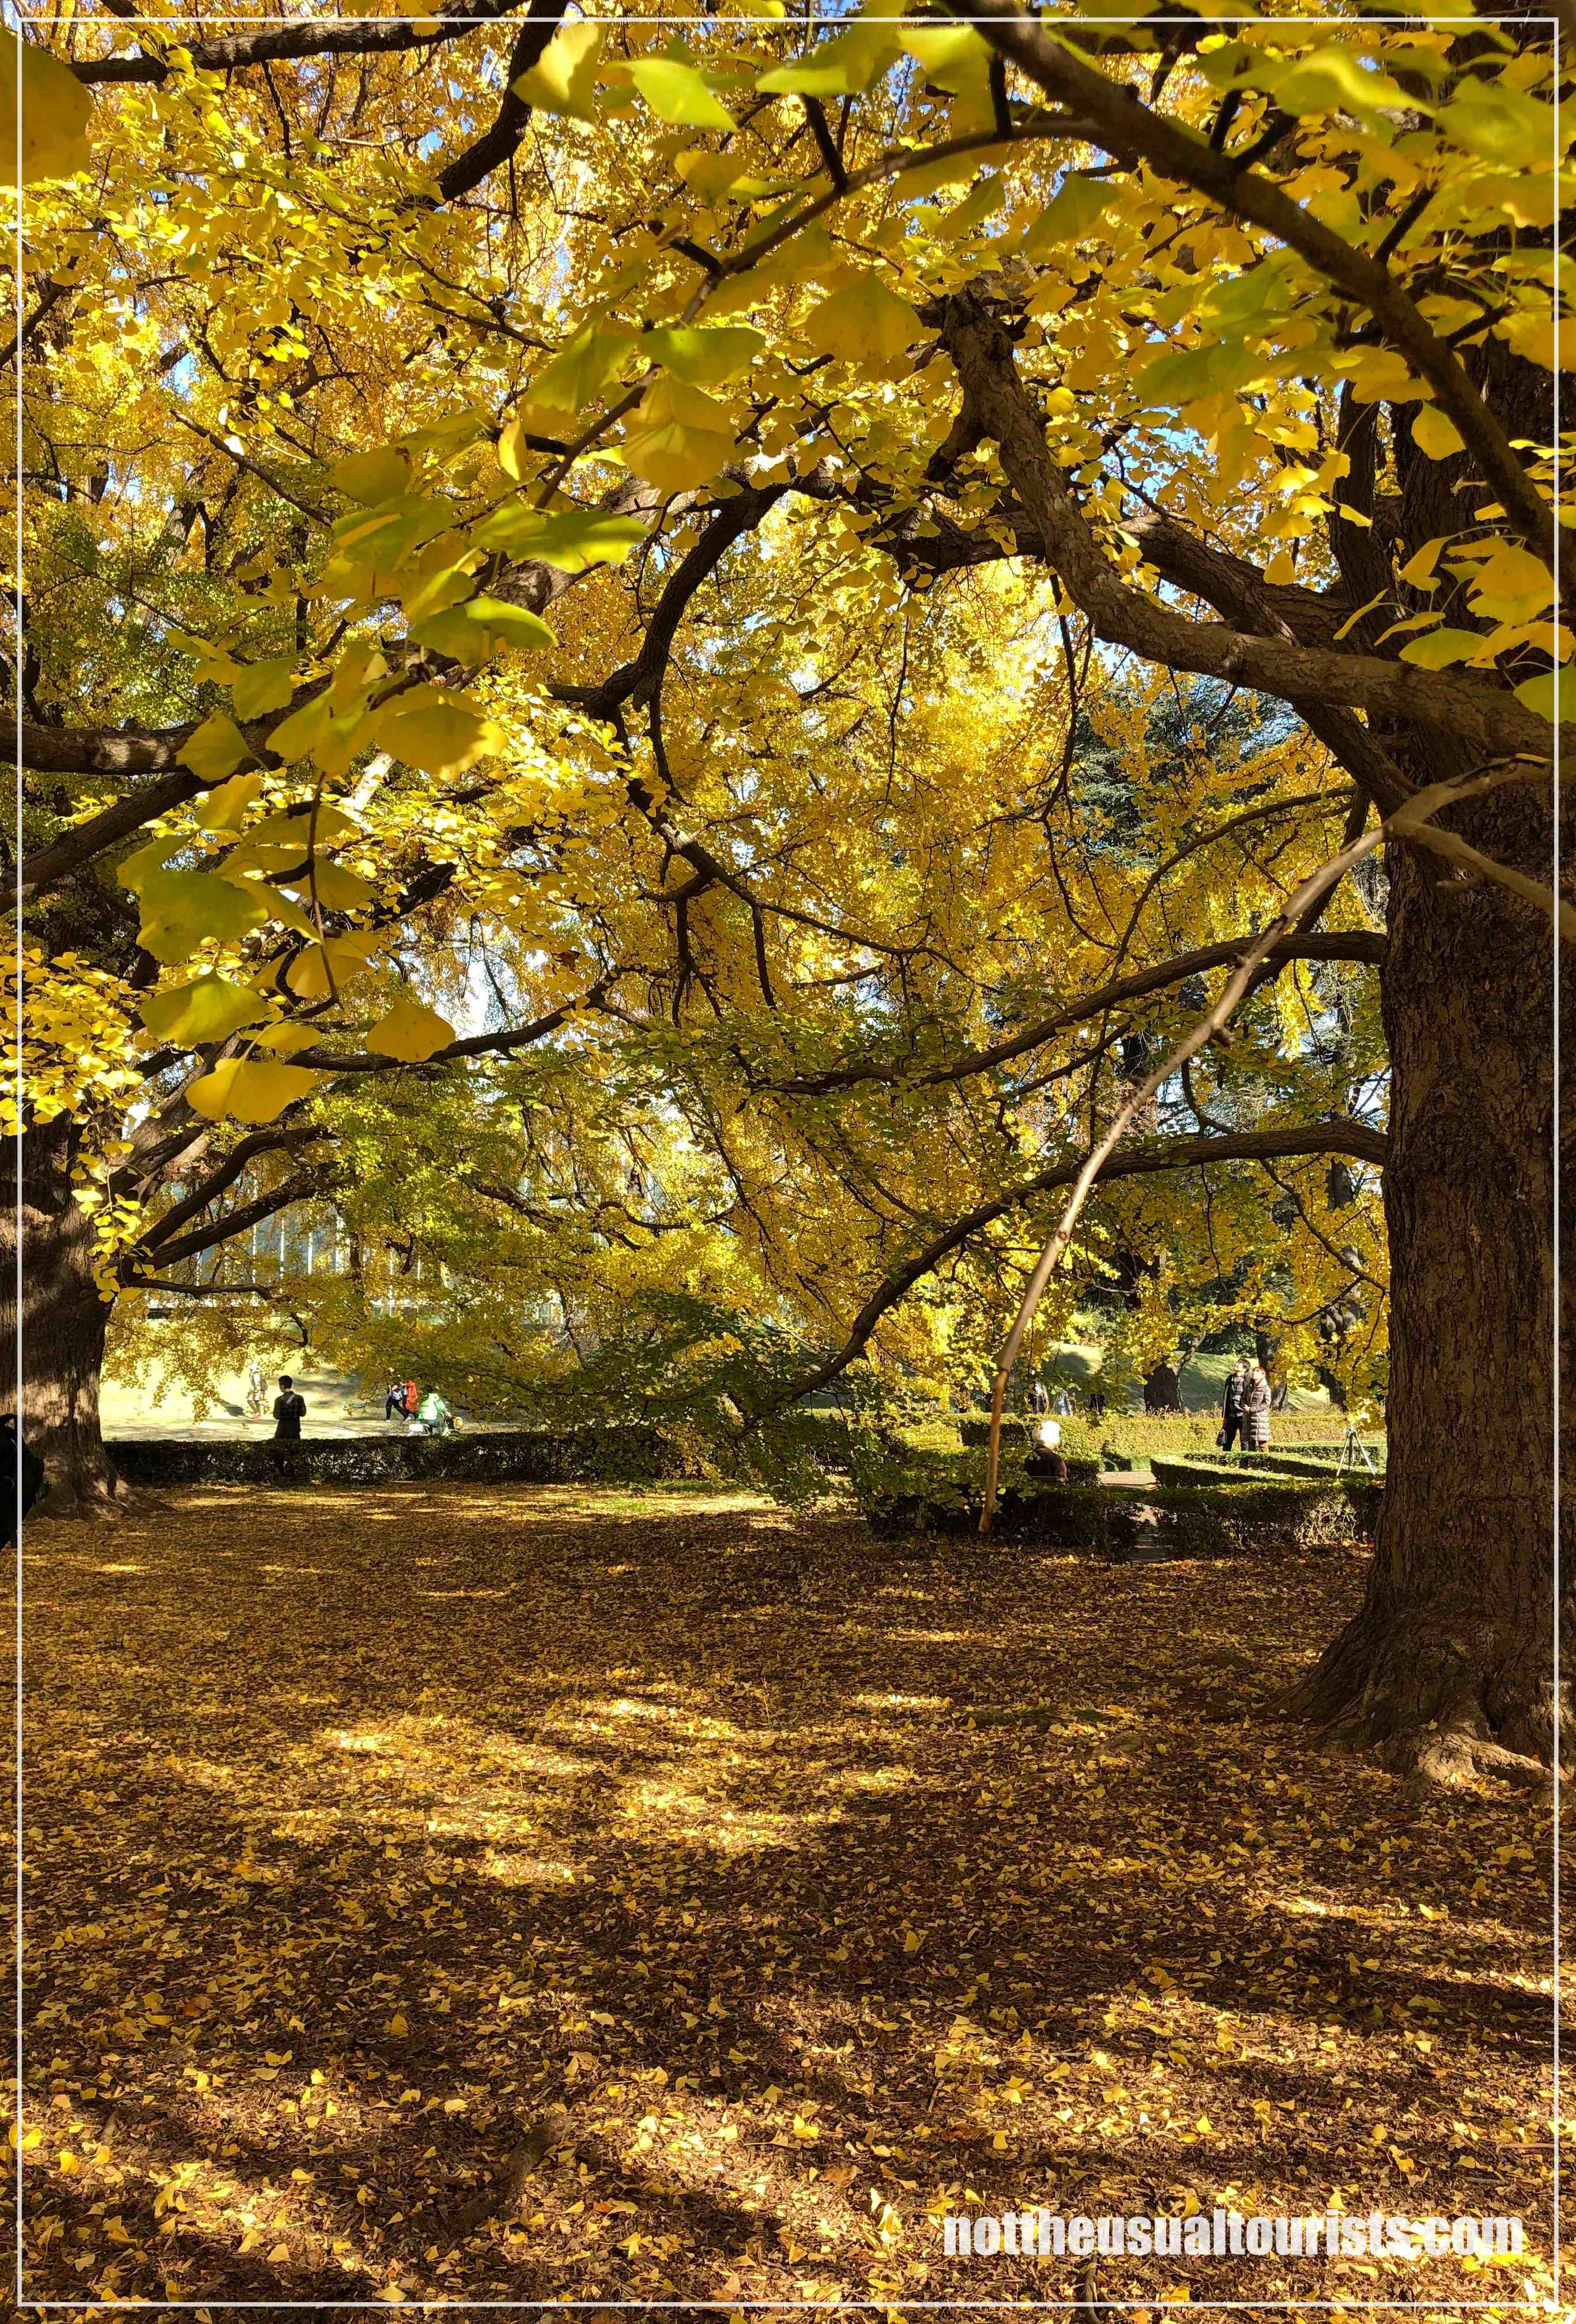 Albero di gingko / Gingko tree